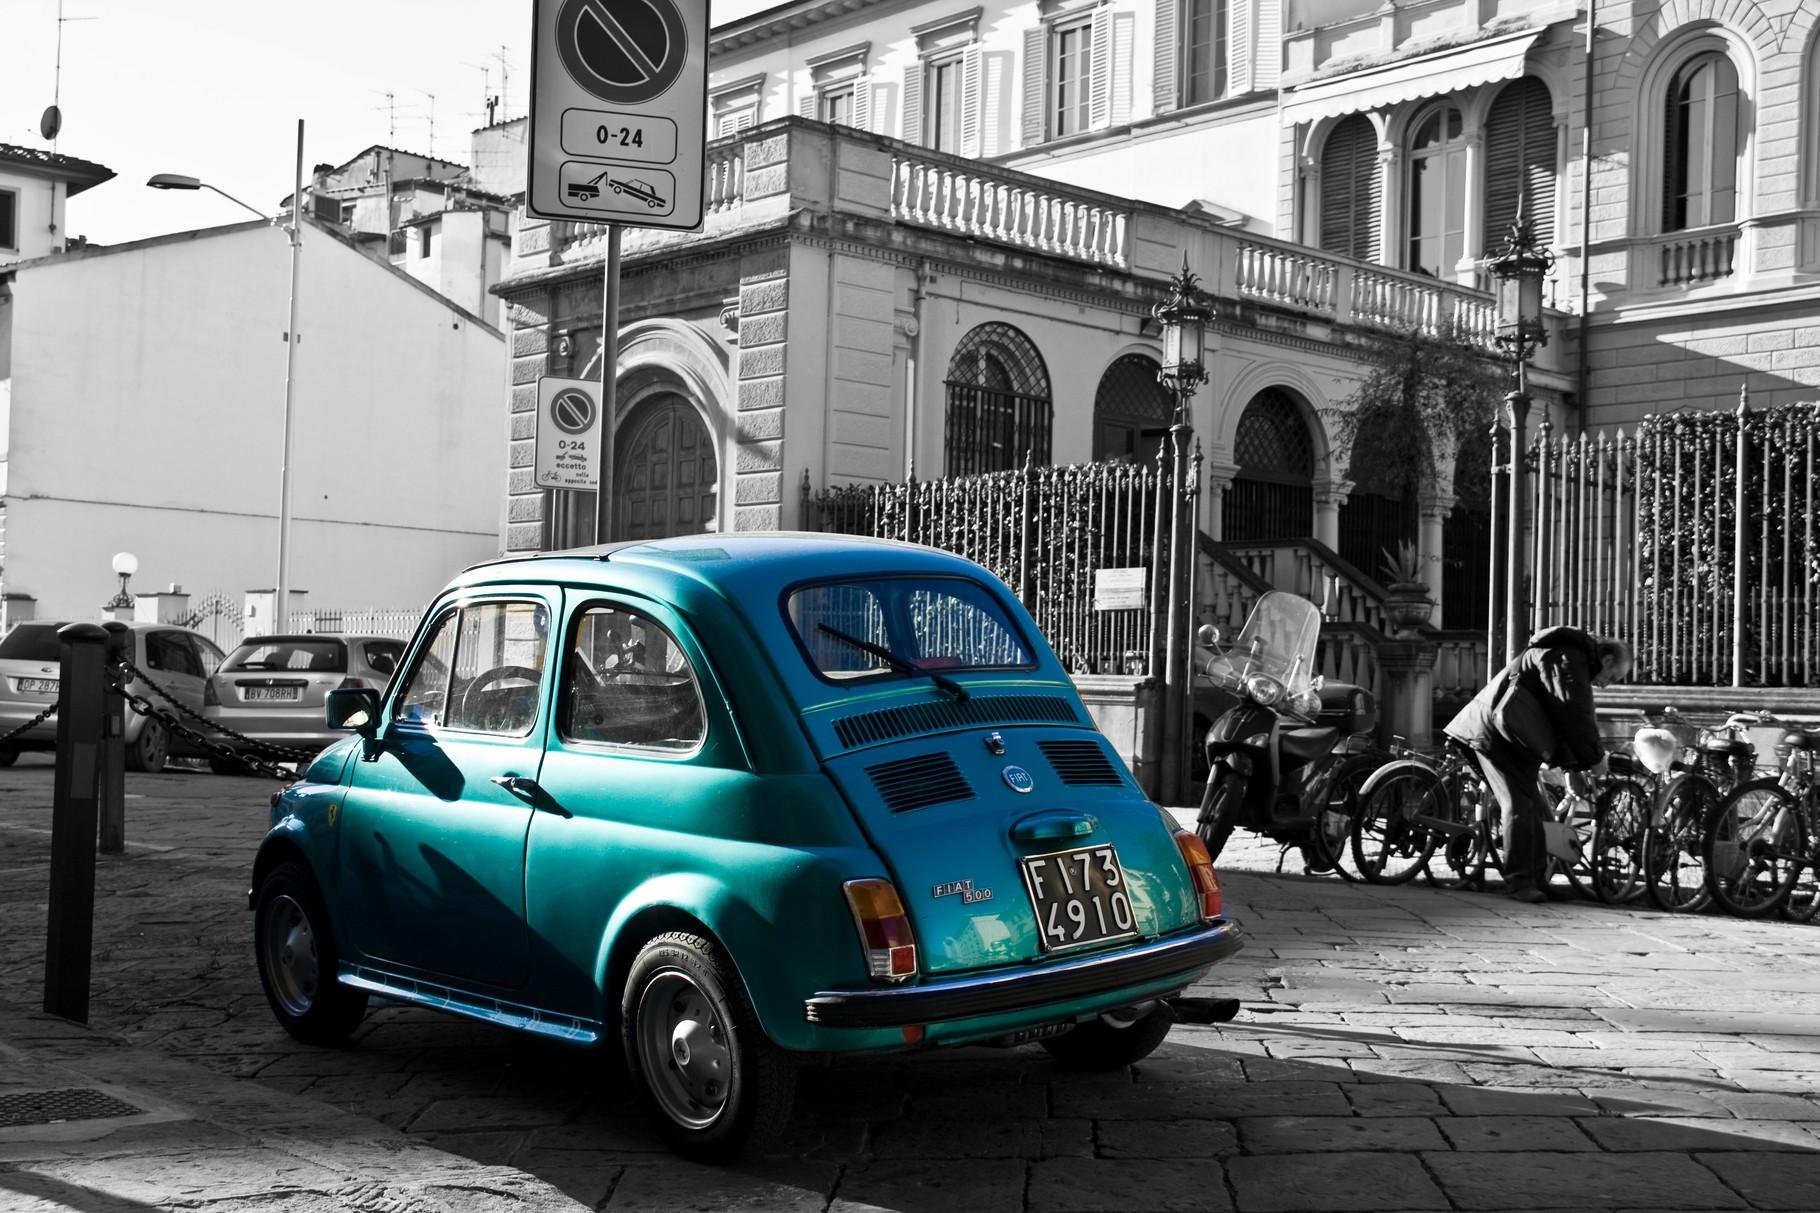 42_Florenz.